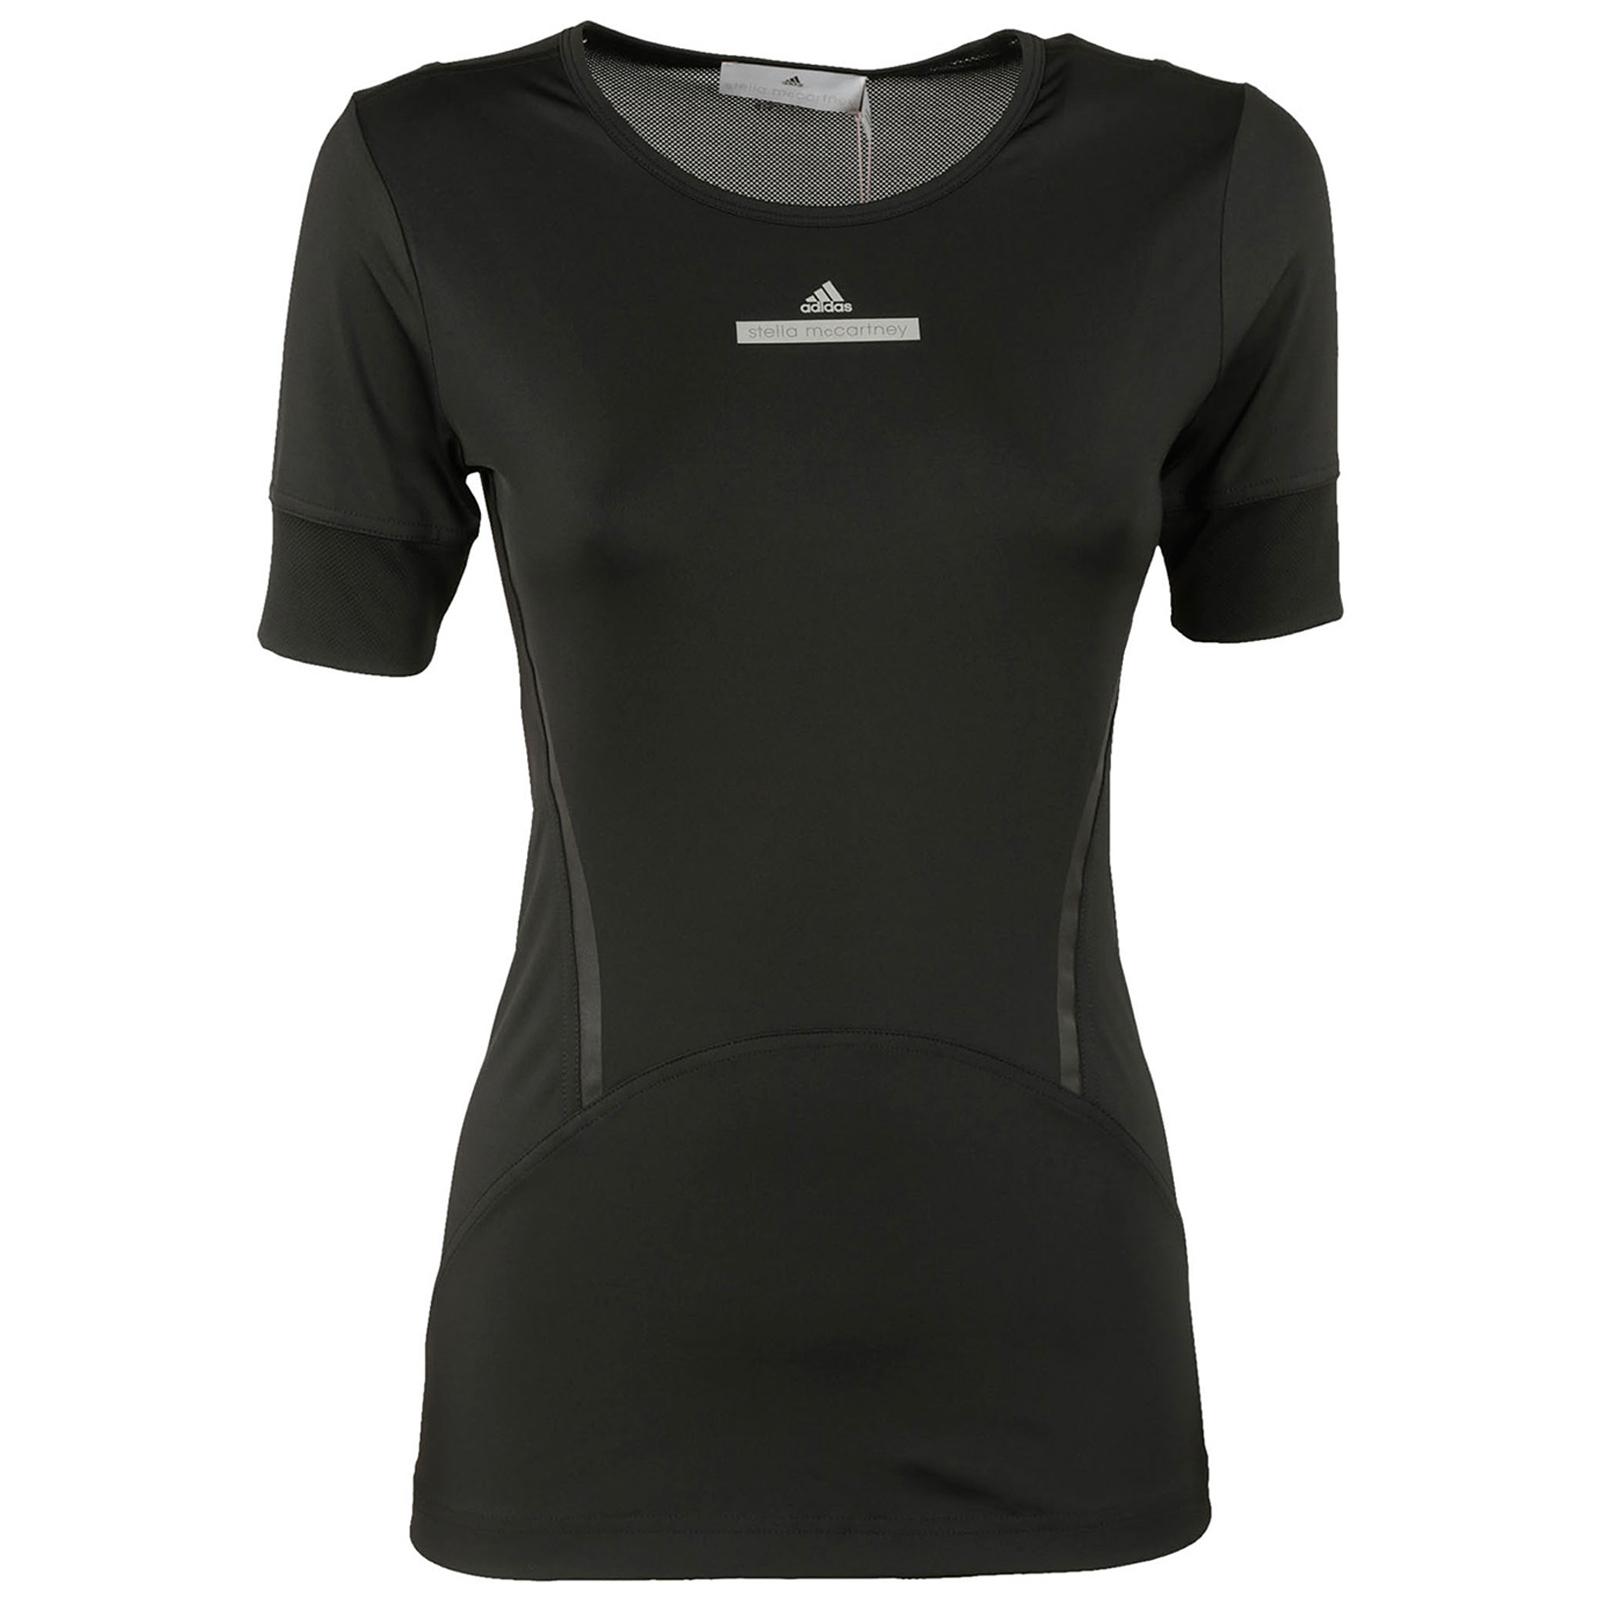 T-shirt ras du cou col rond manches courtes femme clima cool running run